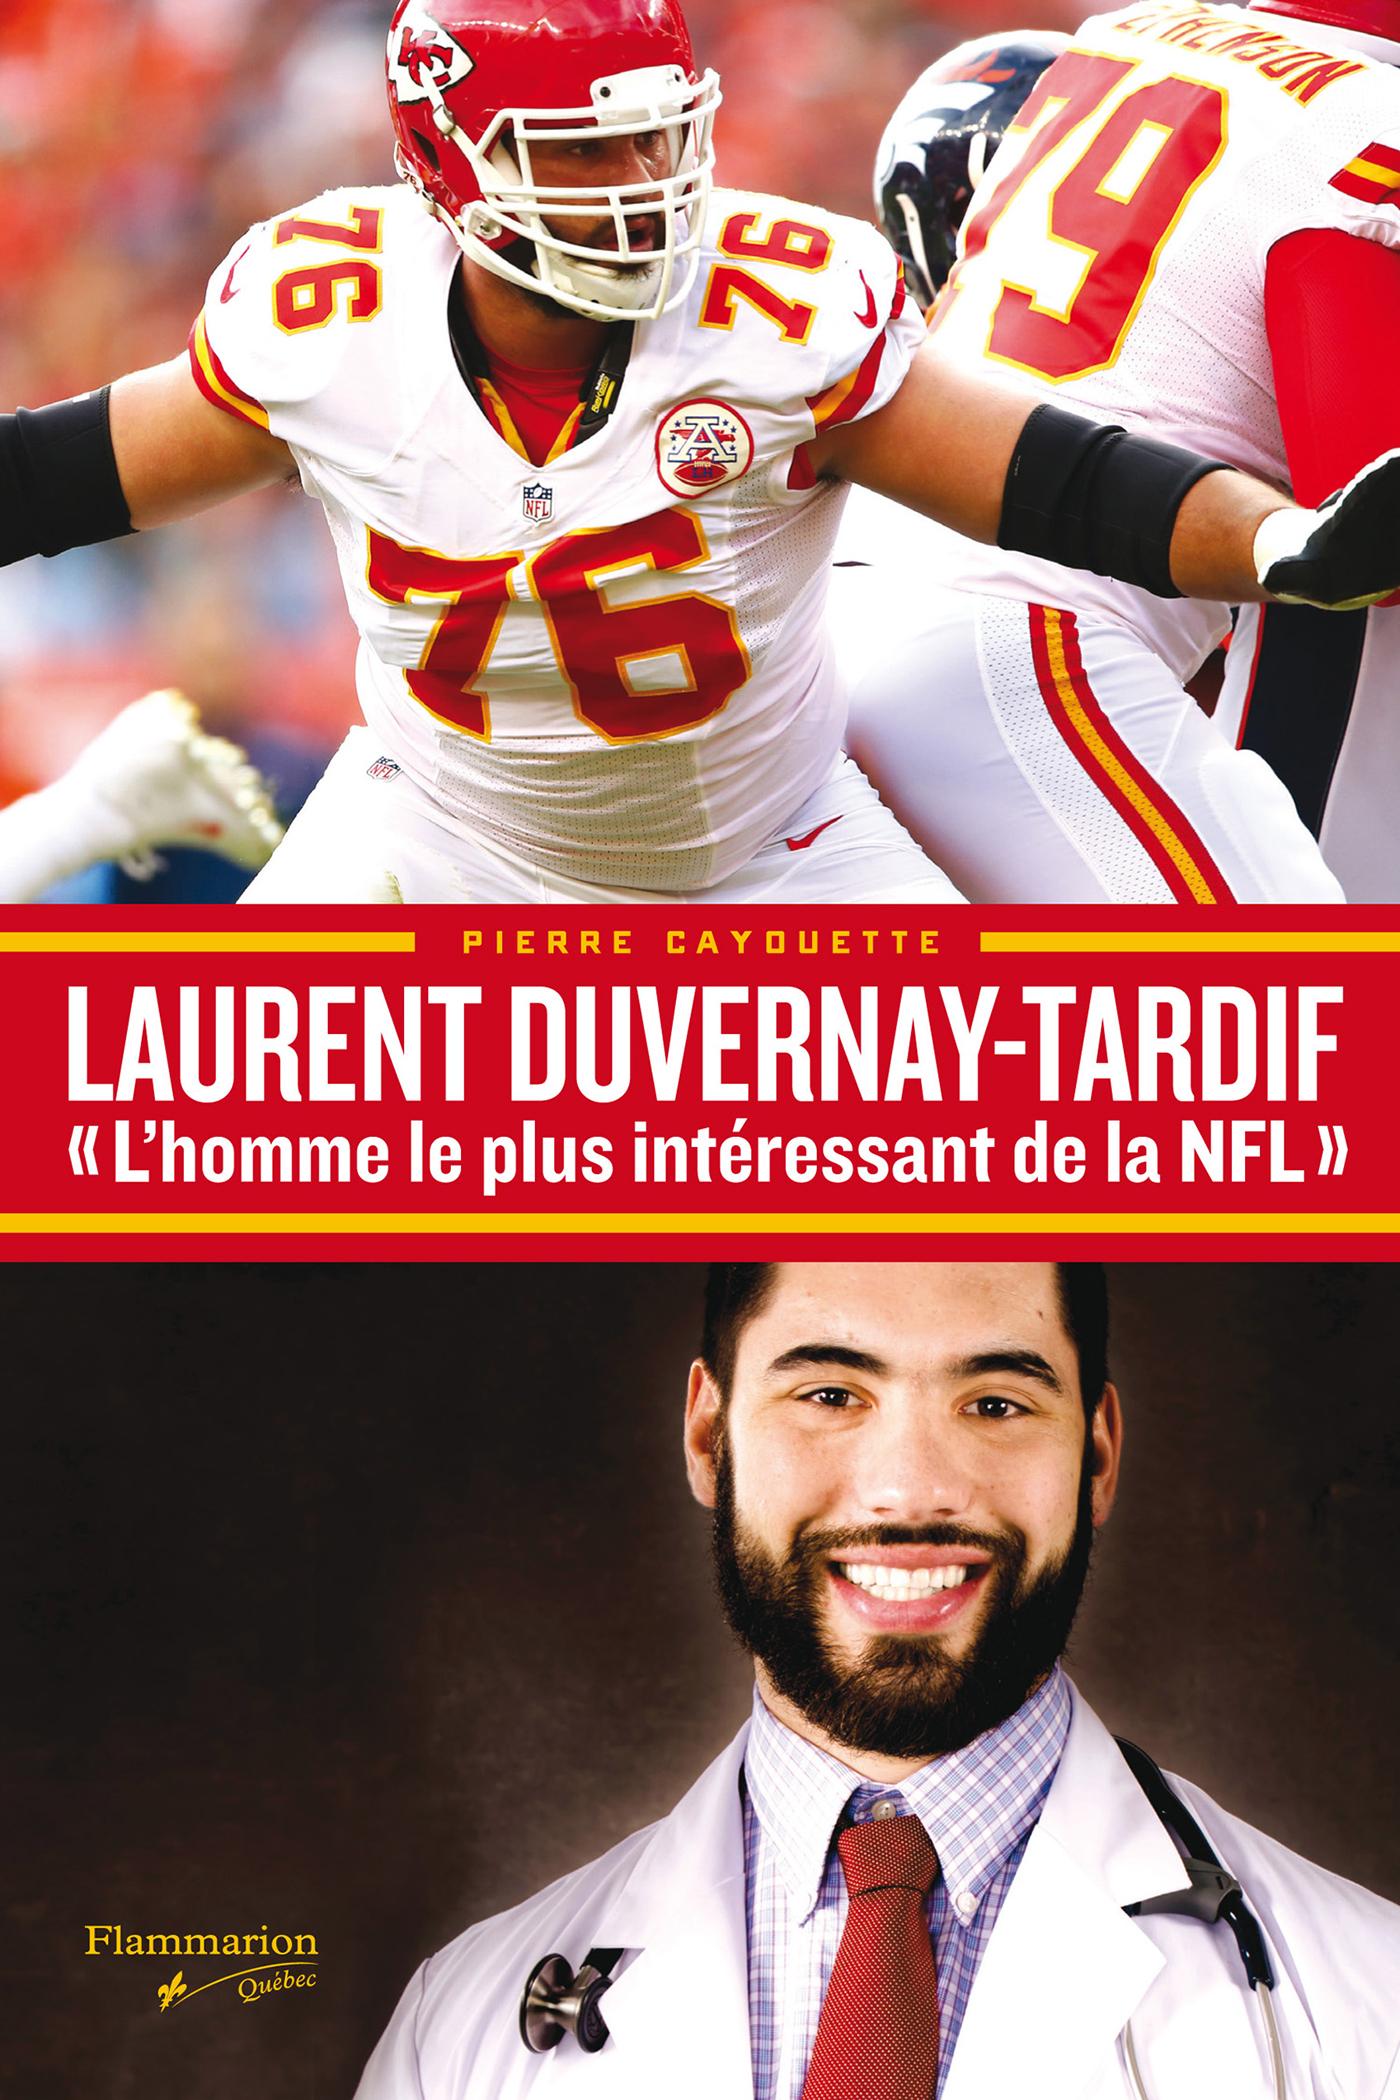 Laurent Duvernay-Tardif